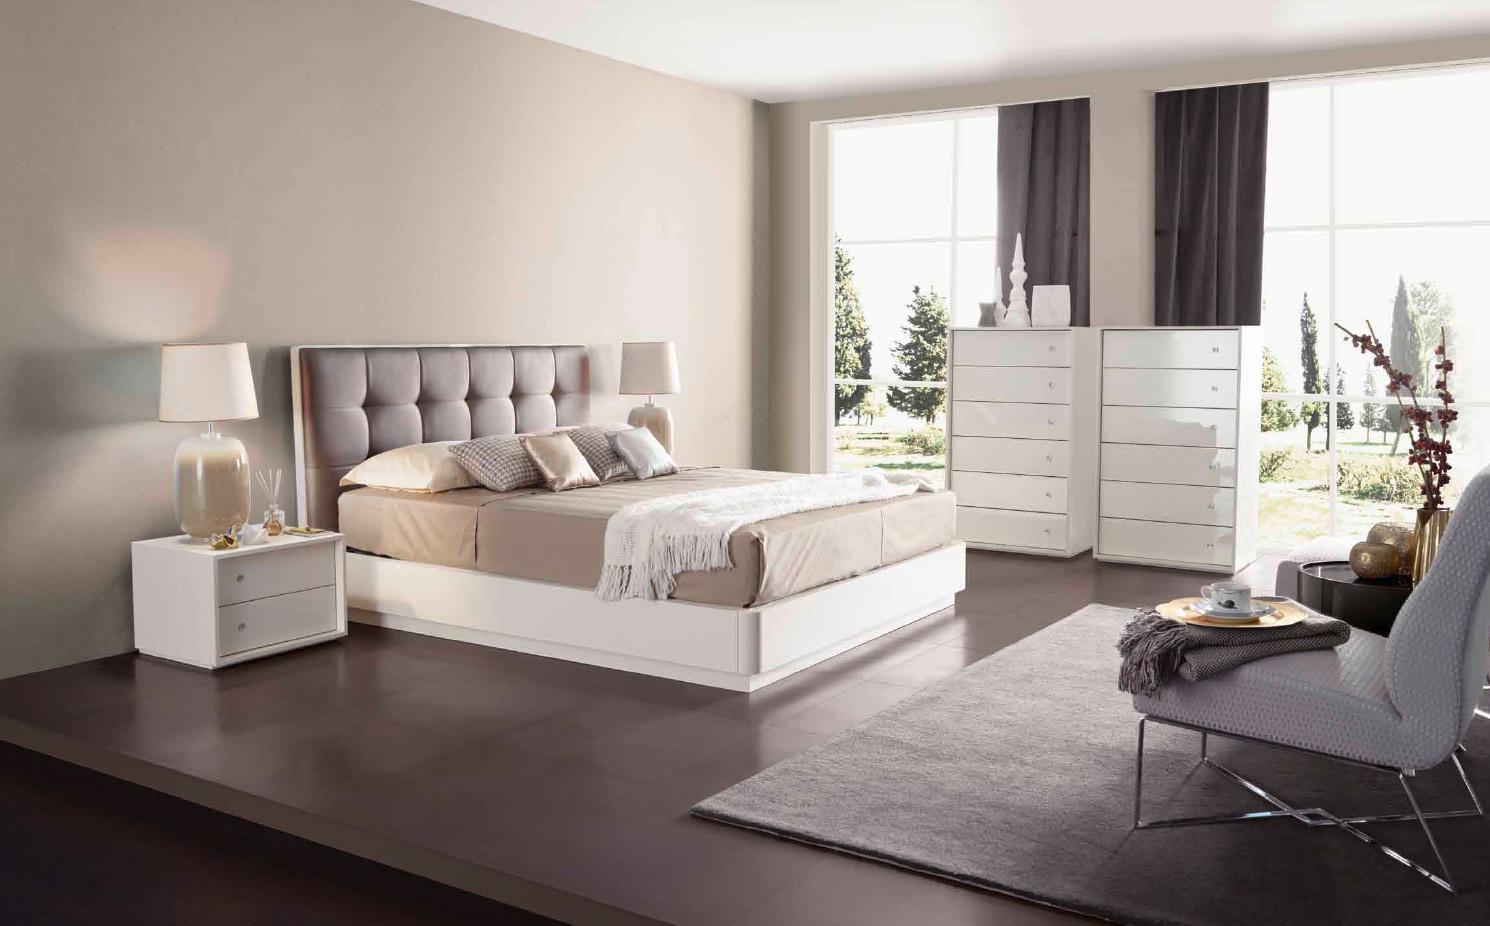 Un dormitorio moderno villalba interiorismo - Cortinas dormitorio moderno ...